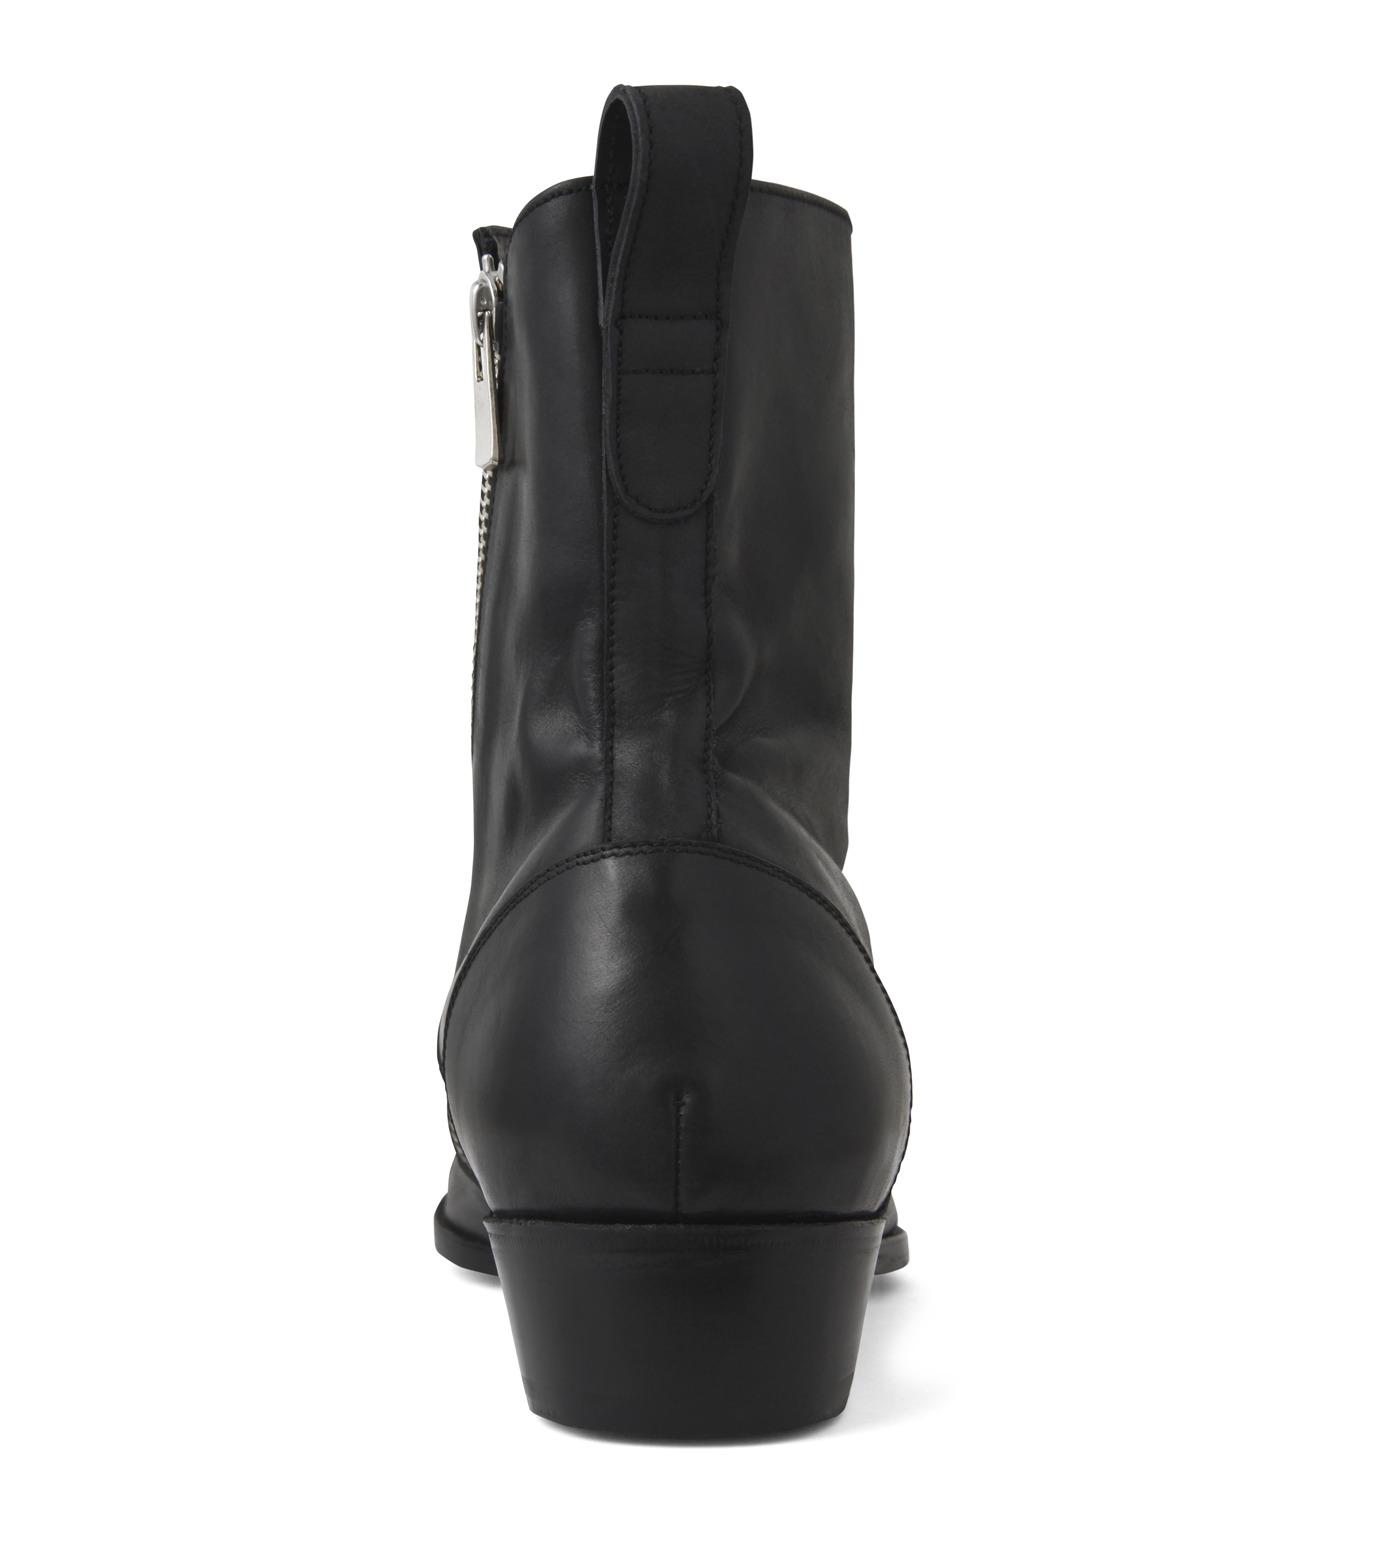 HL HEDDIE LOVU(エイチエル・エディールーヴ)のSIDE ZIP BOOTS-BLACK(シューズ/shoes)-18S90002-13 拡大詳細画像2